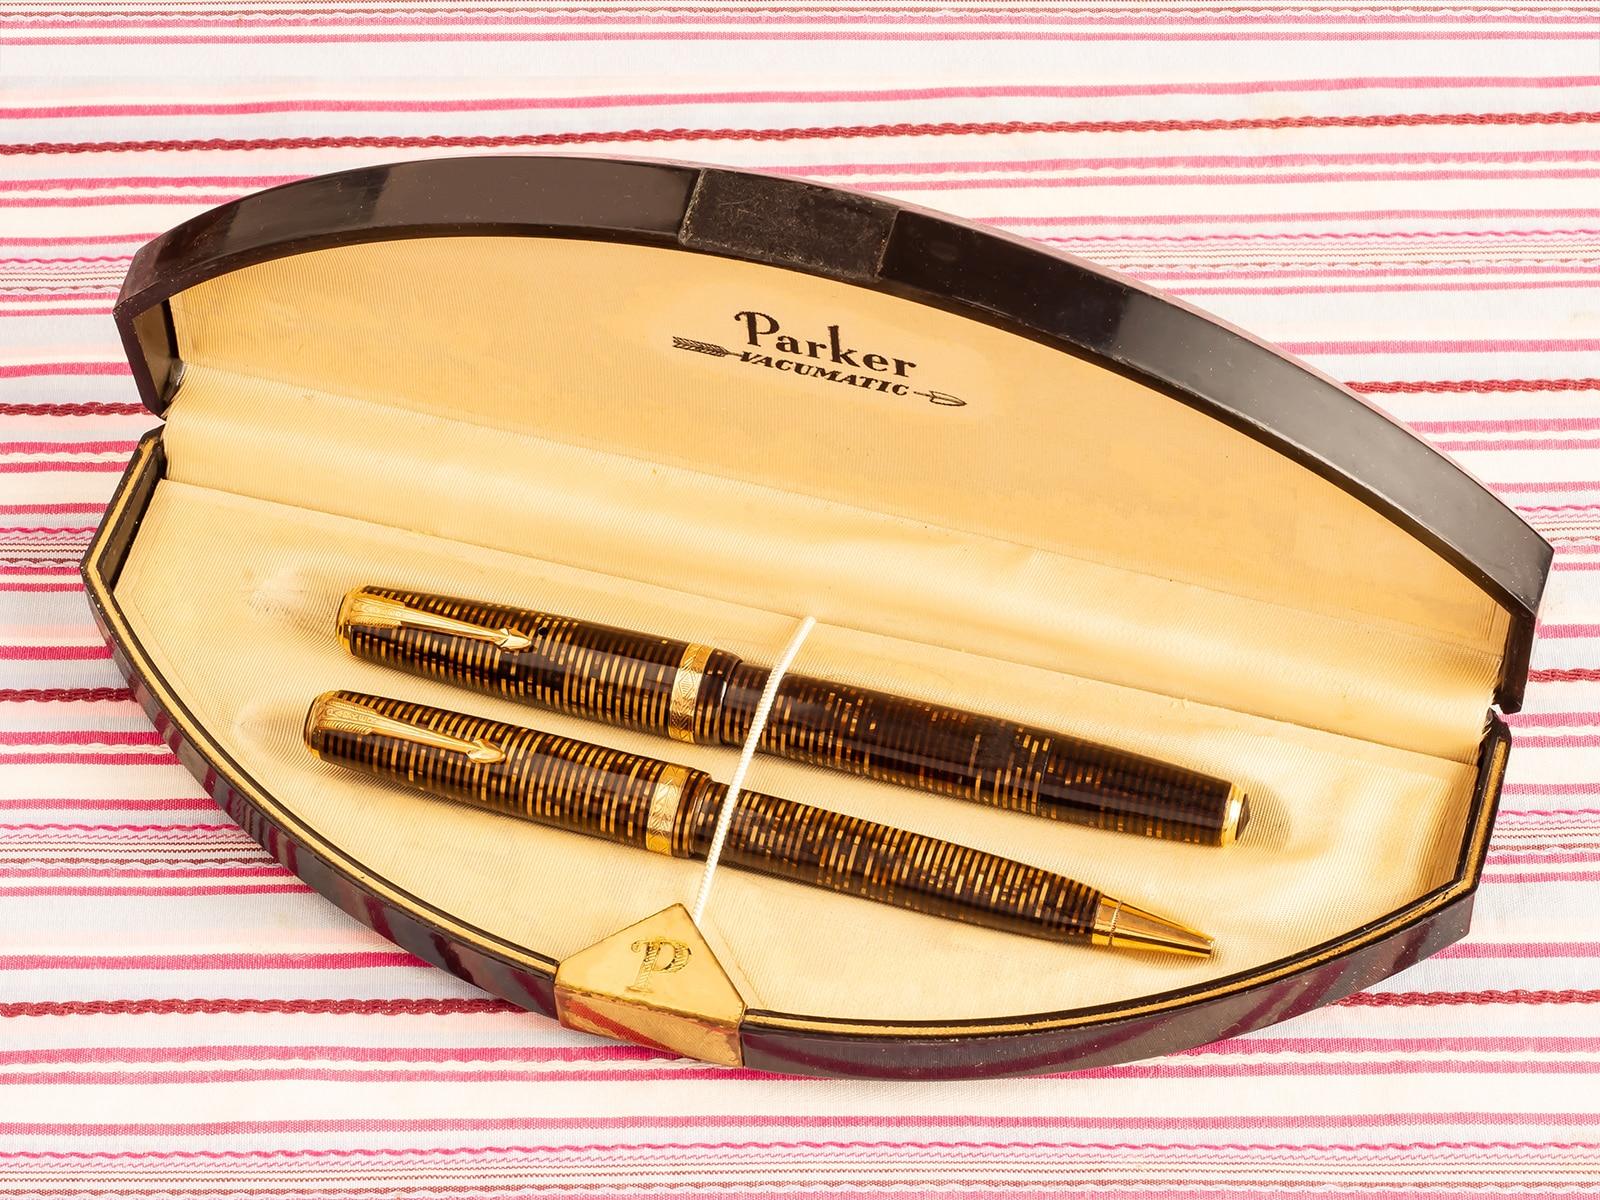 Vintage Parker Vacumatic Star-clip Golden tiger eye striped fountain pen pencil box set